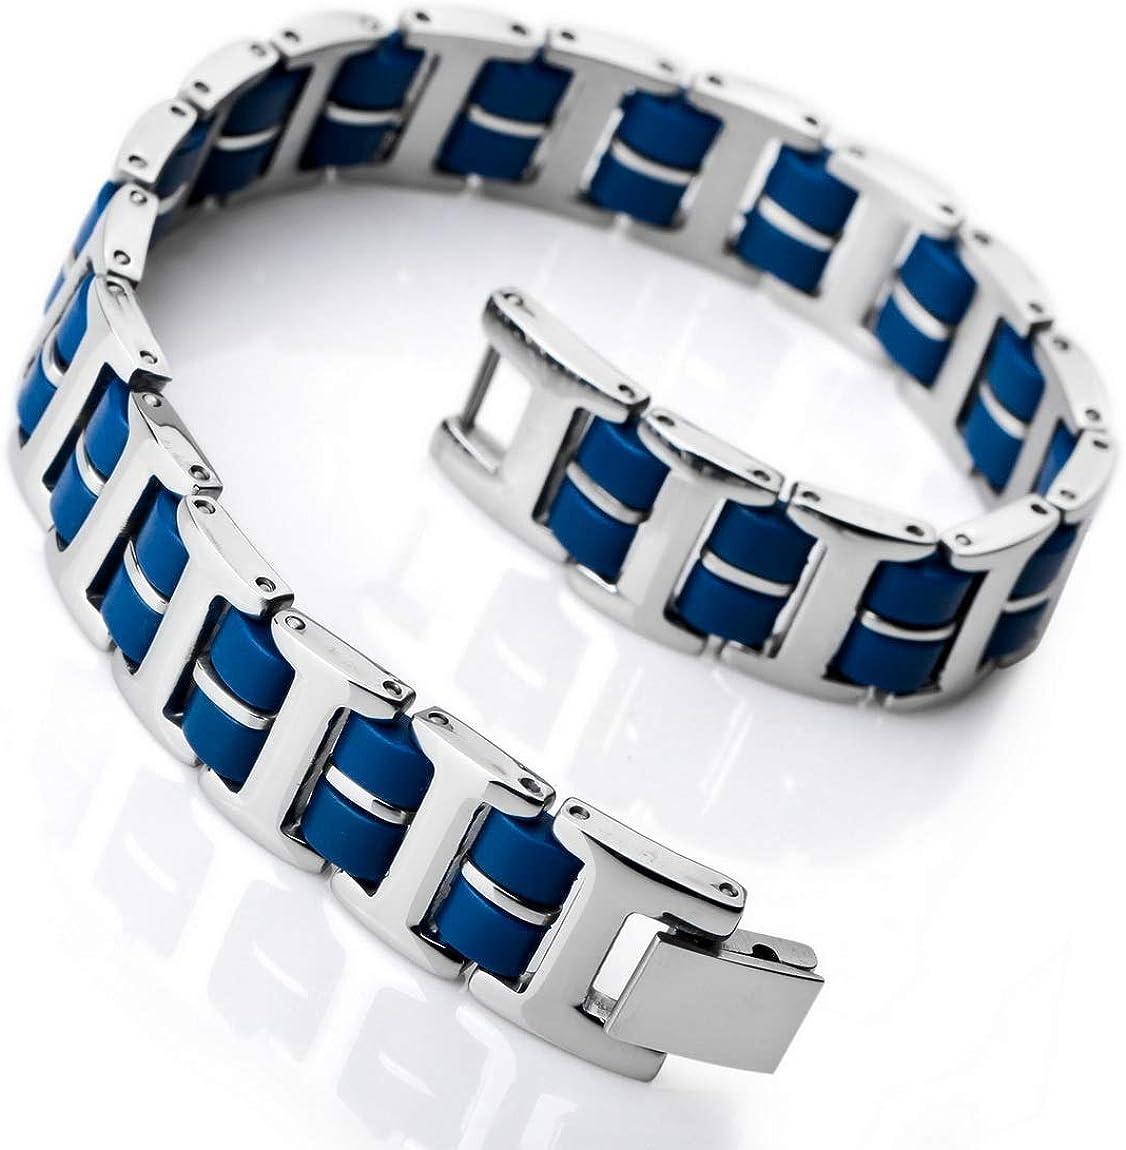 INBLUE Men's Stainless Steel Rubber Max 65% OFF Link Wrist Industry No. 1 Bracelet T Silver